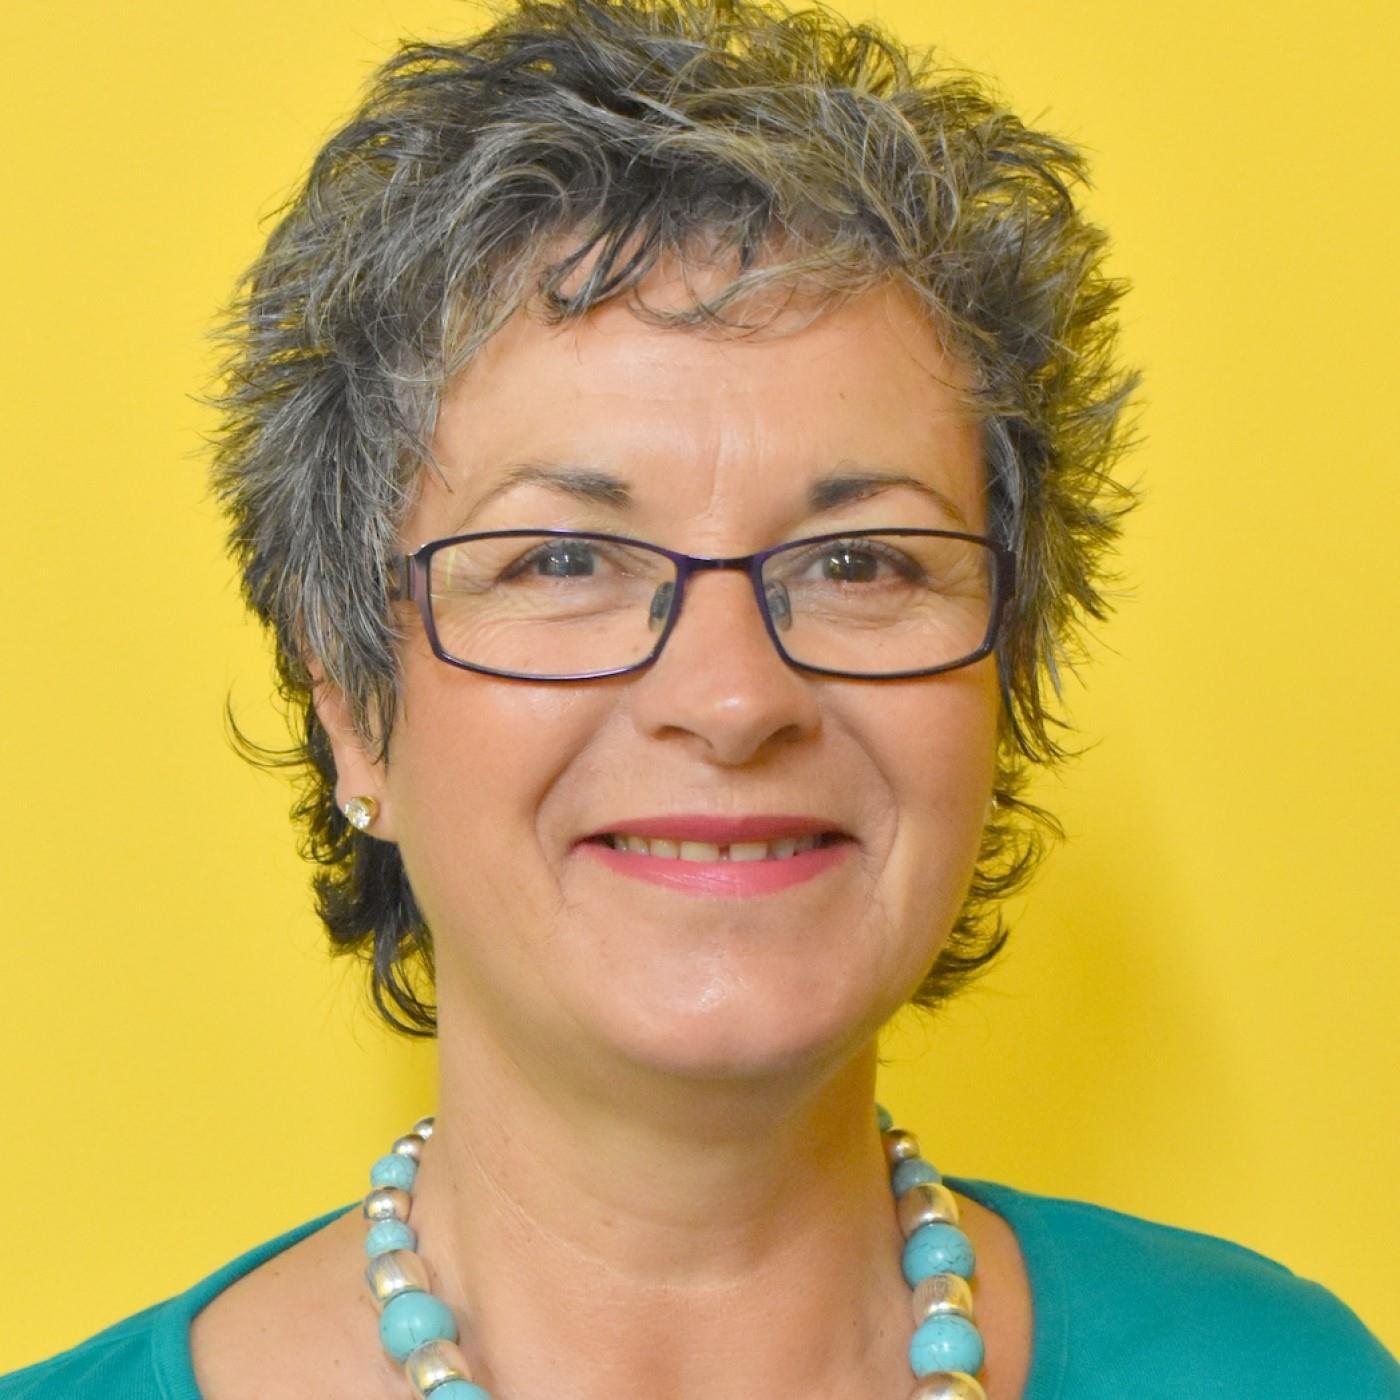 Naturopathy with Bridgitt-21-09-2021 Bridgitt chats about The Holistic Care of the Elderly